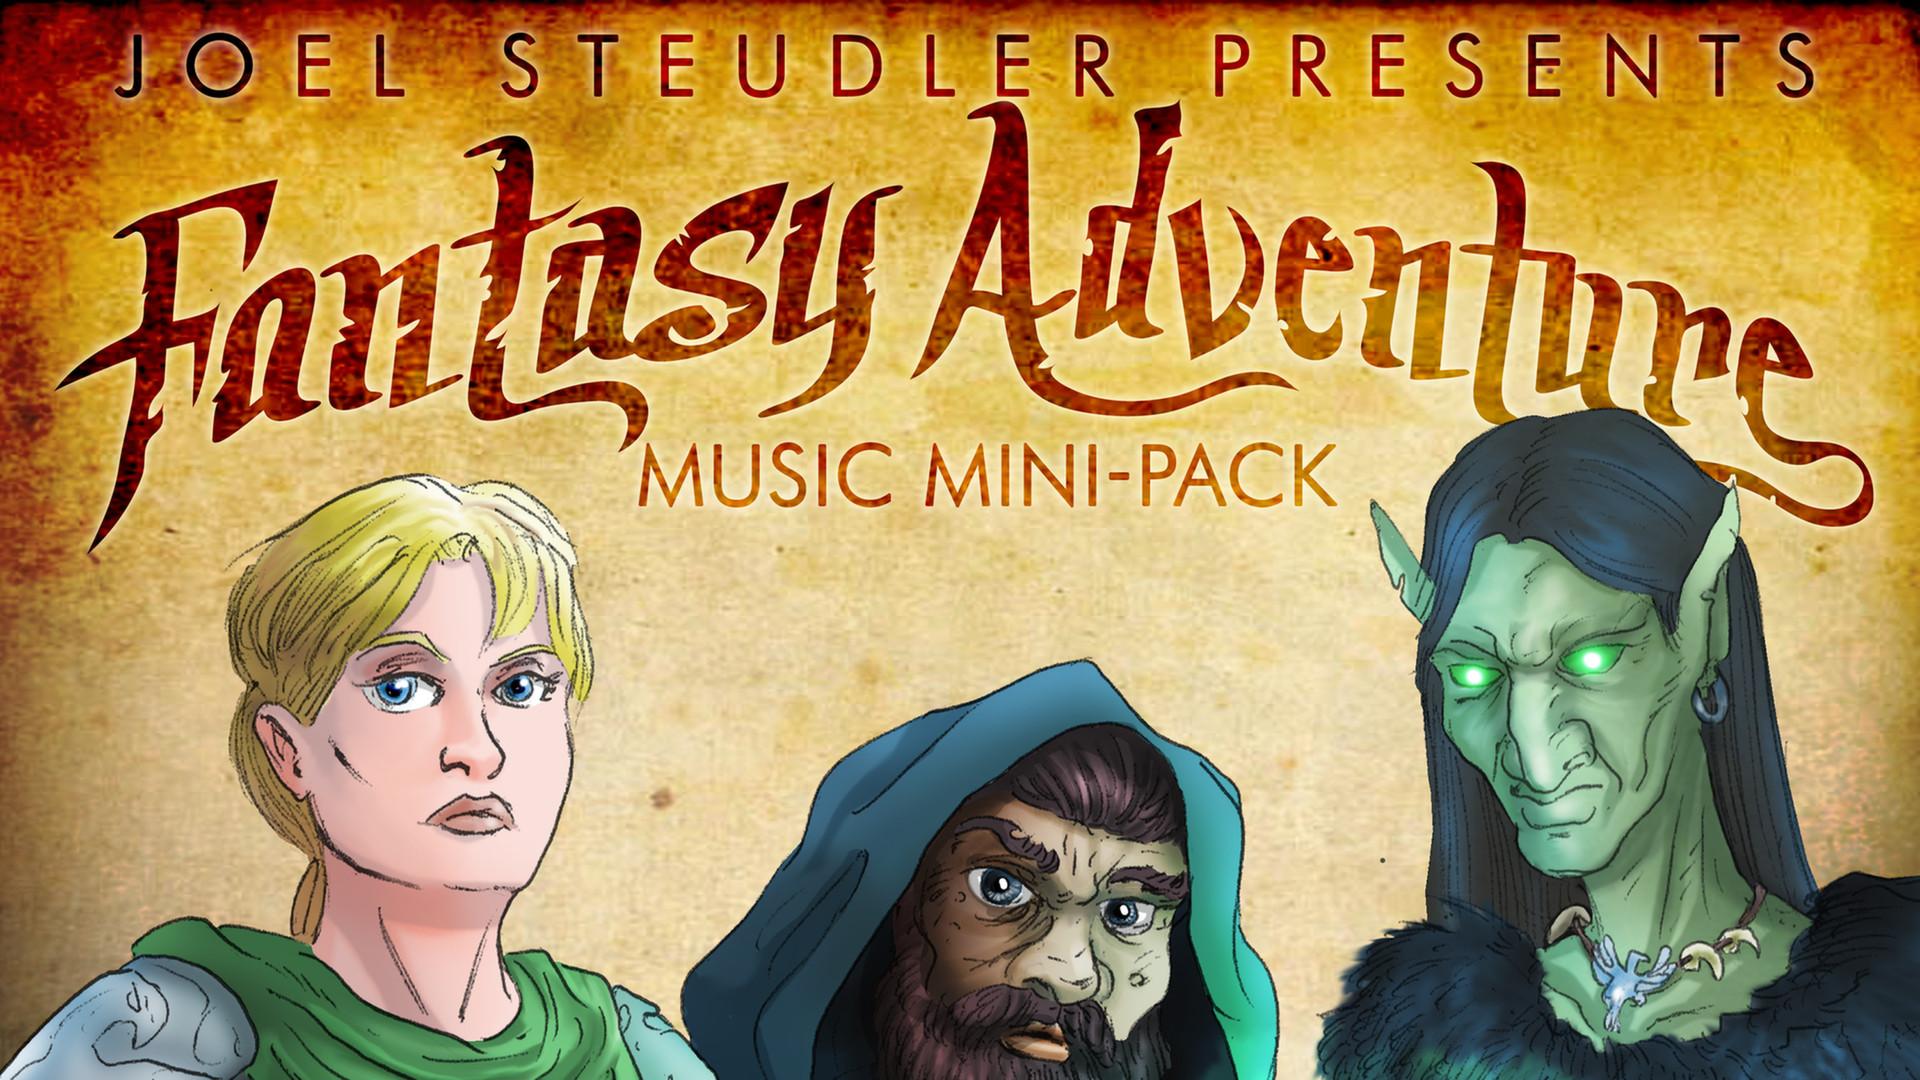 RPG Maker VX Ace - Fantasy Adventure Mini Music Pack screenshot